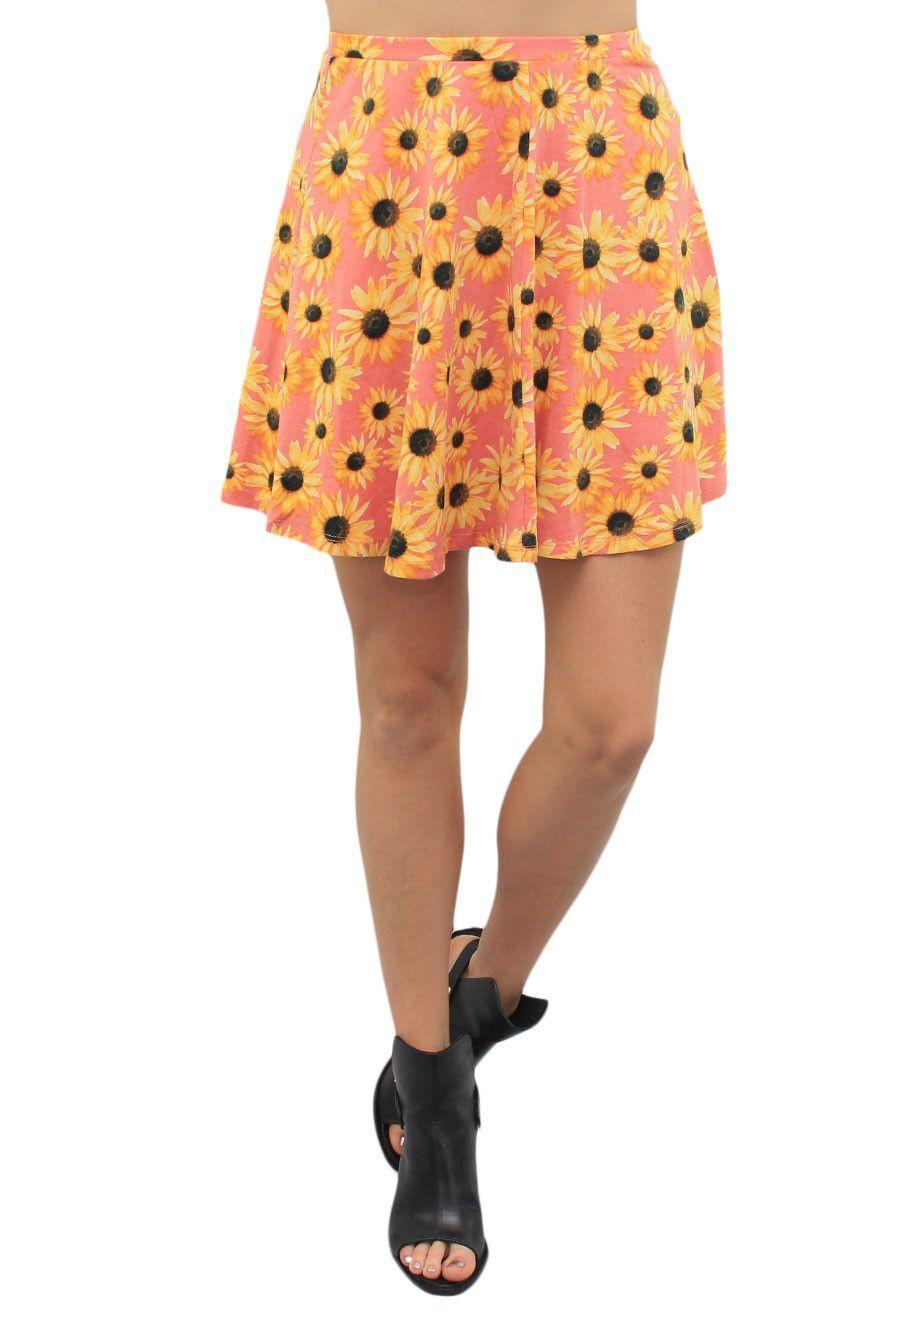 Orange Sunflower Skirt #Boutiquedresses #wholesaledresses #wholesaleclothing #boutiquewholesaleclothing #womenswholesaleclothing #wholesaleclothinboutique #wholesaledresses #wholesalejoggers